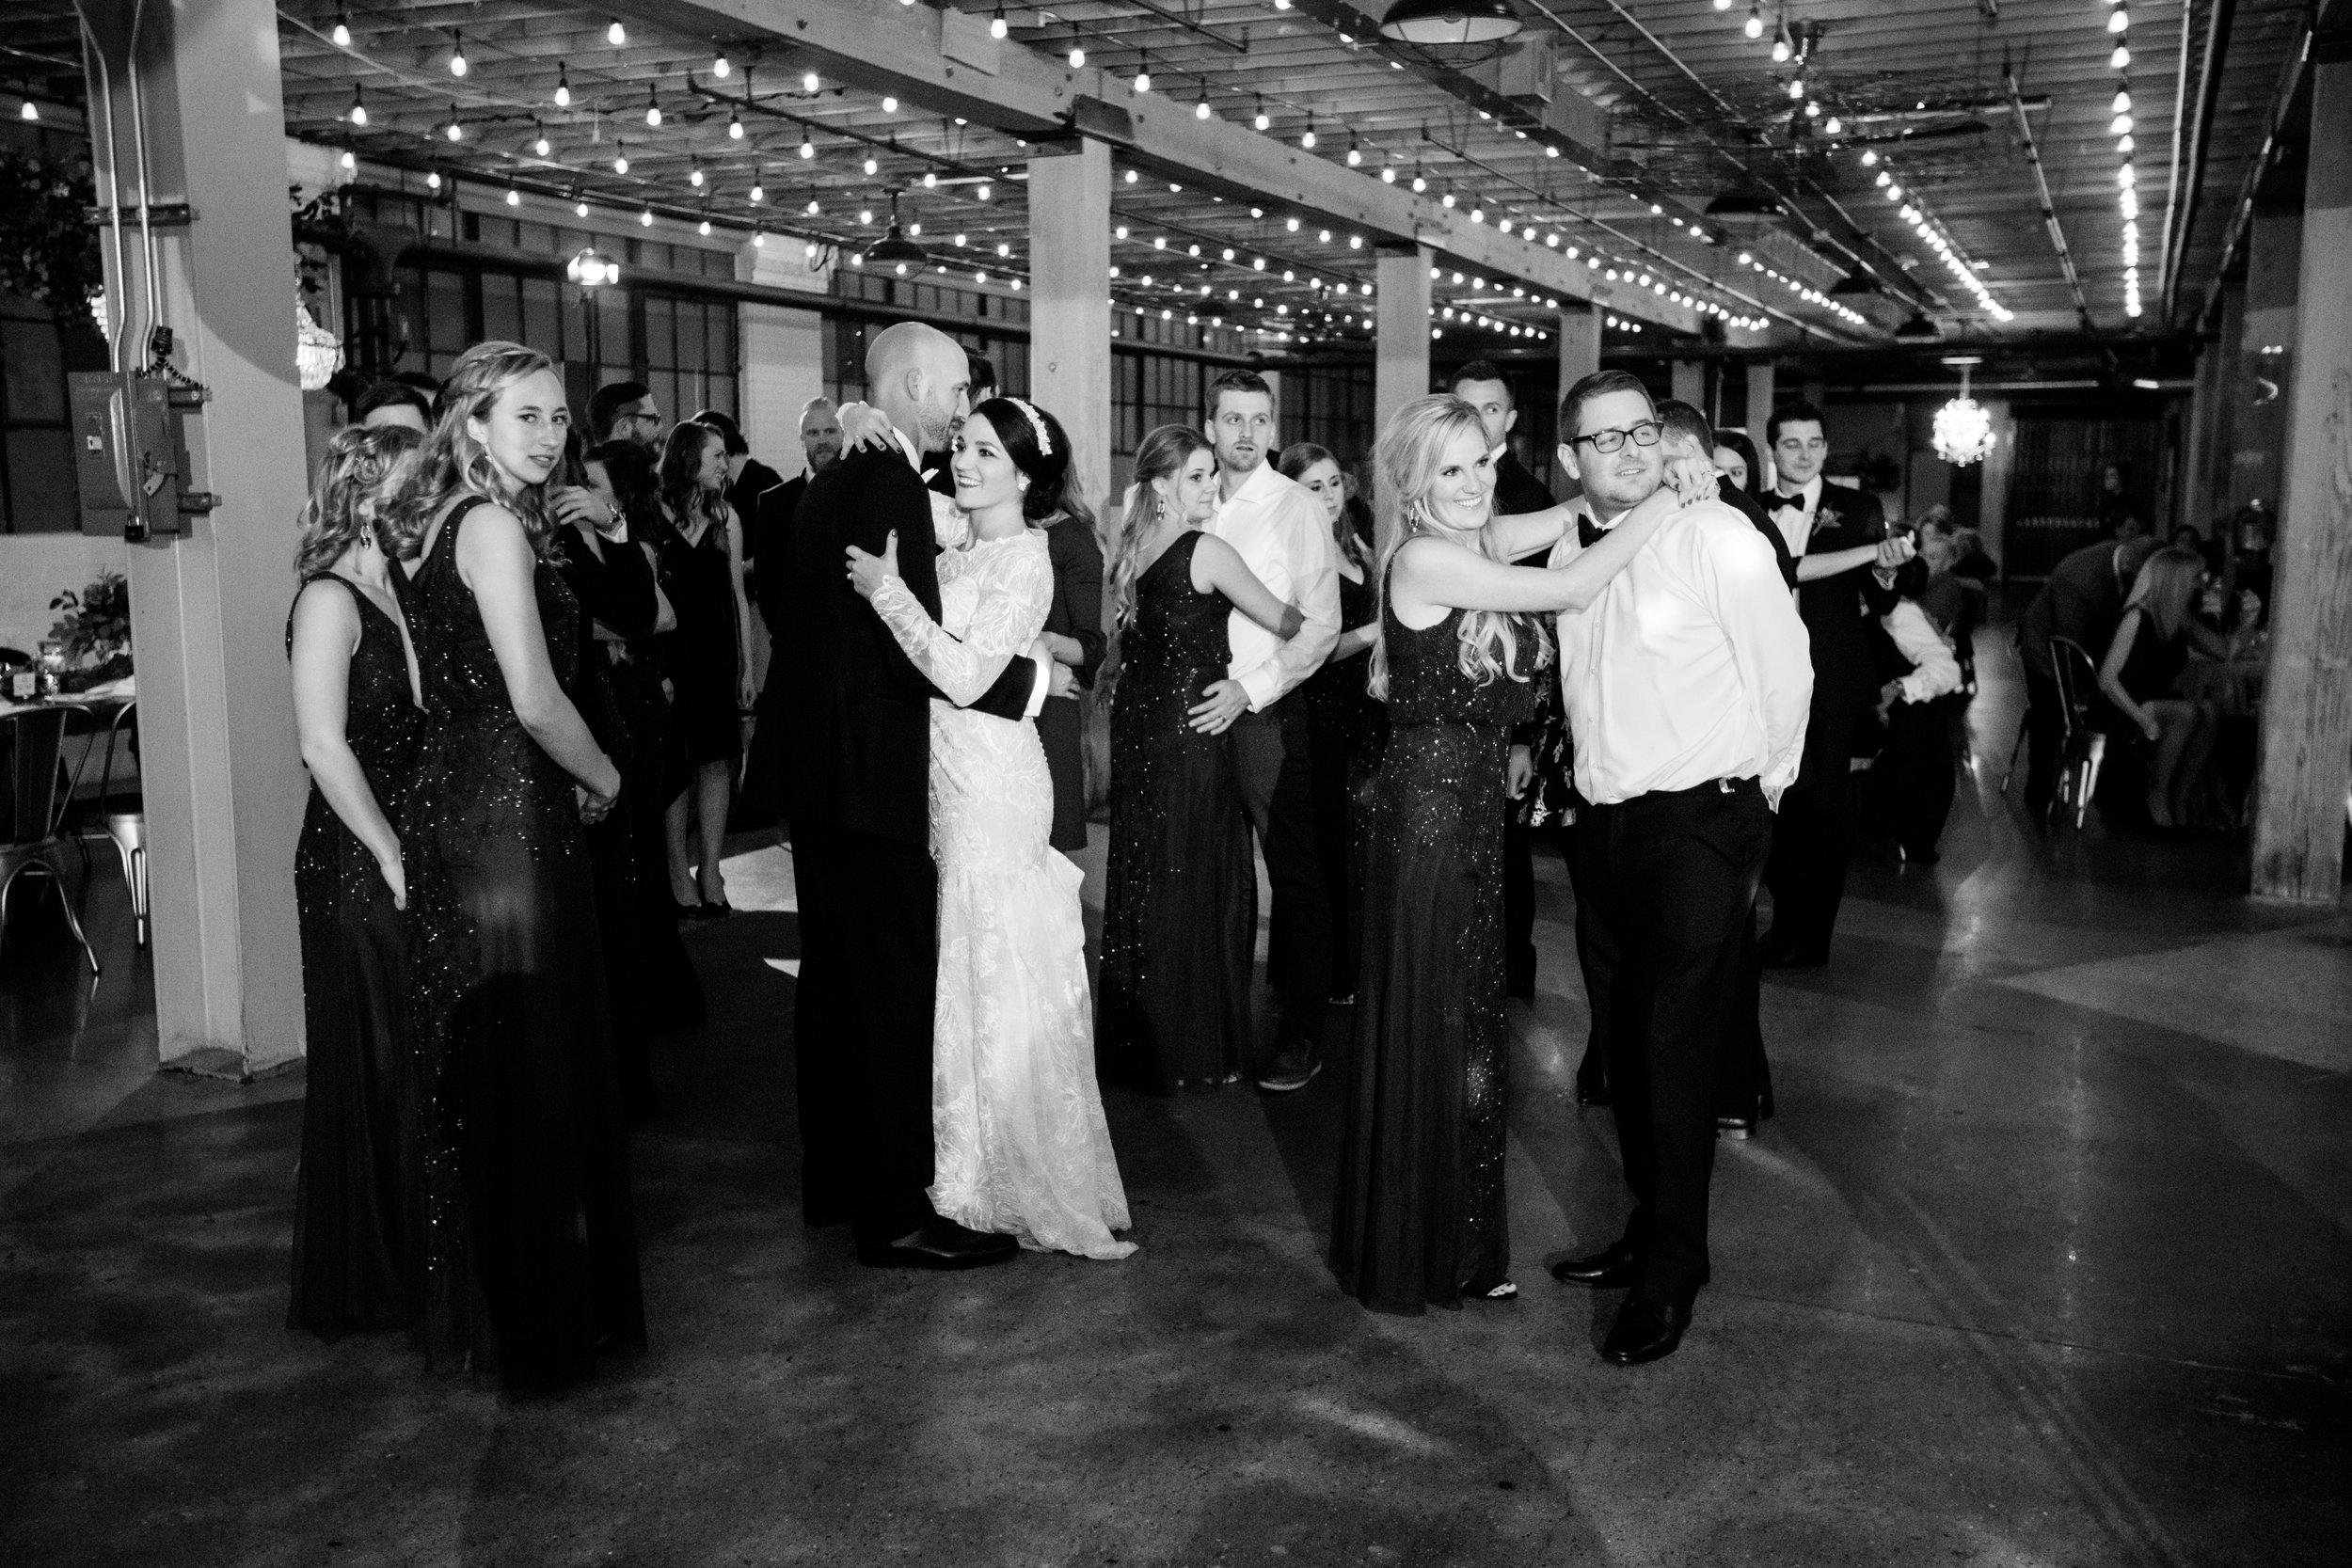 Vogelzang+Wedding+Reception+Dancing2-33.jpg